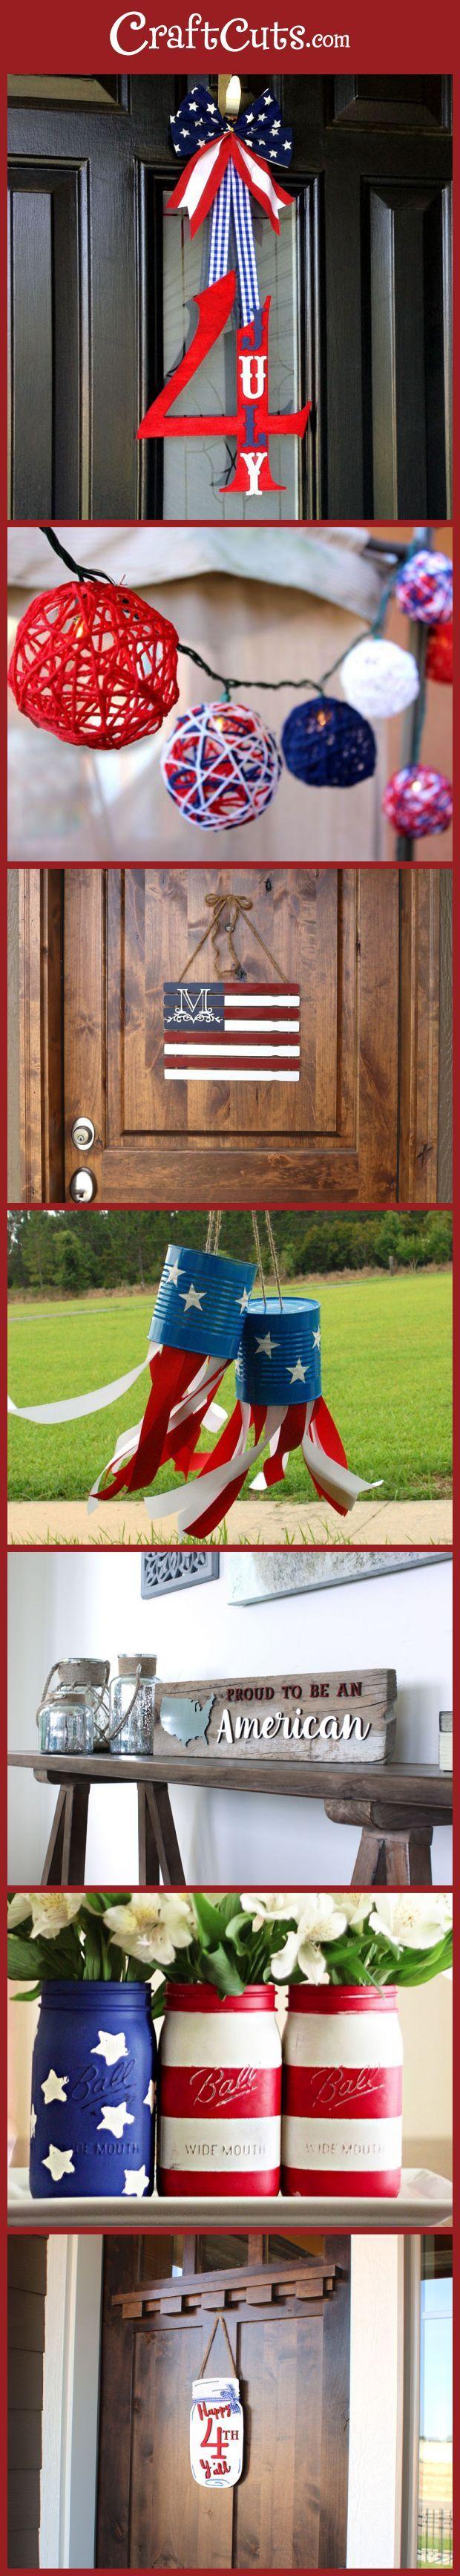 7 Patriotic DIY Ideas | 4th of July Crafts | http://CraftCuts.com